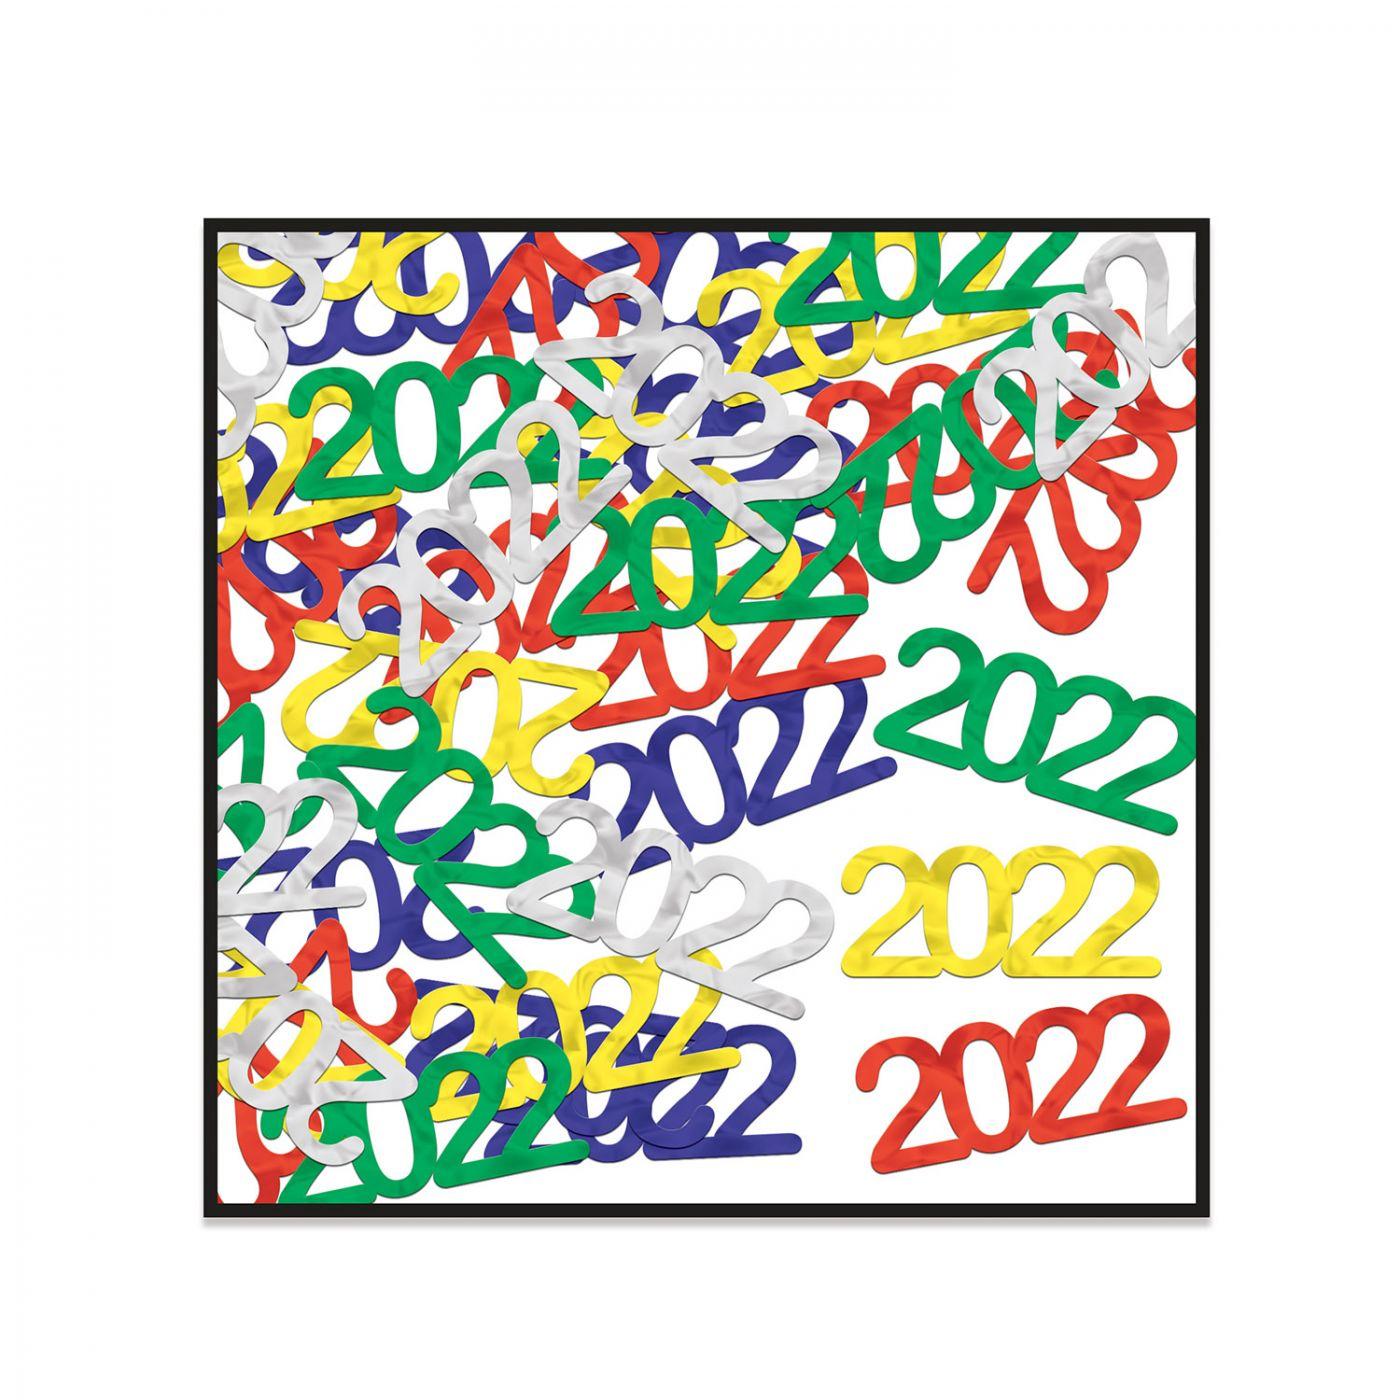 Fanci-Fetti  2022  Silhouettes image